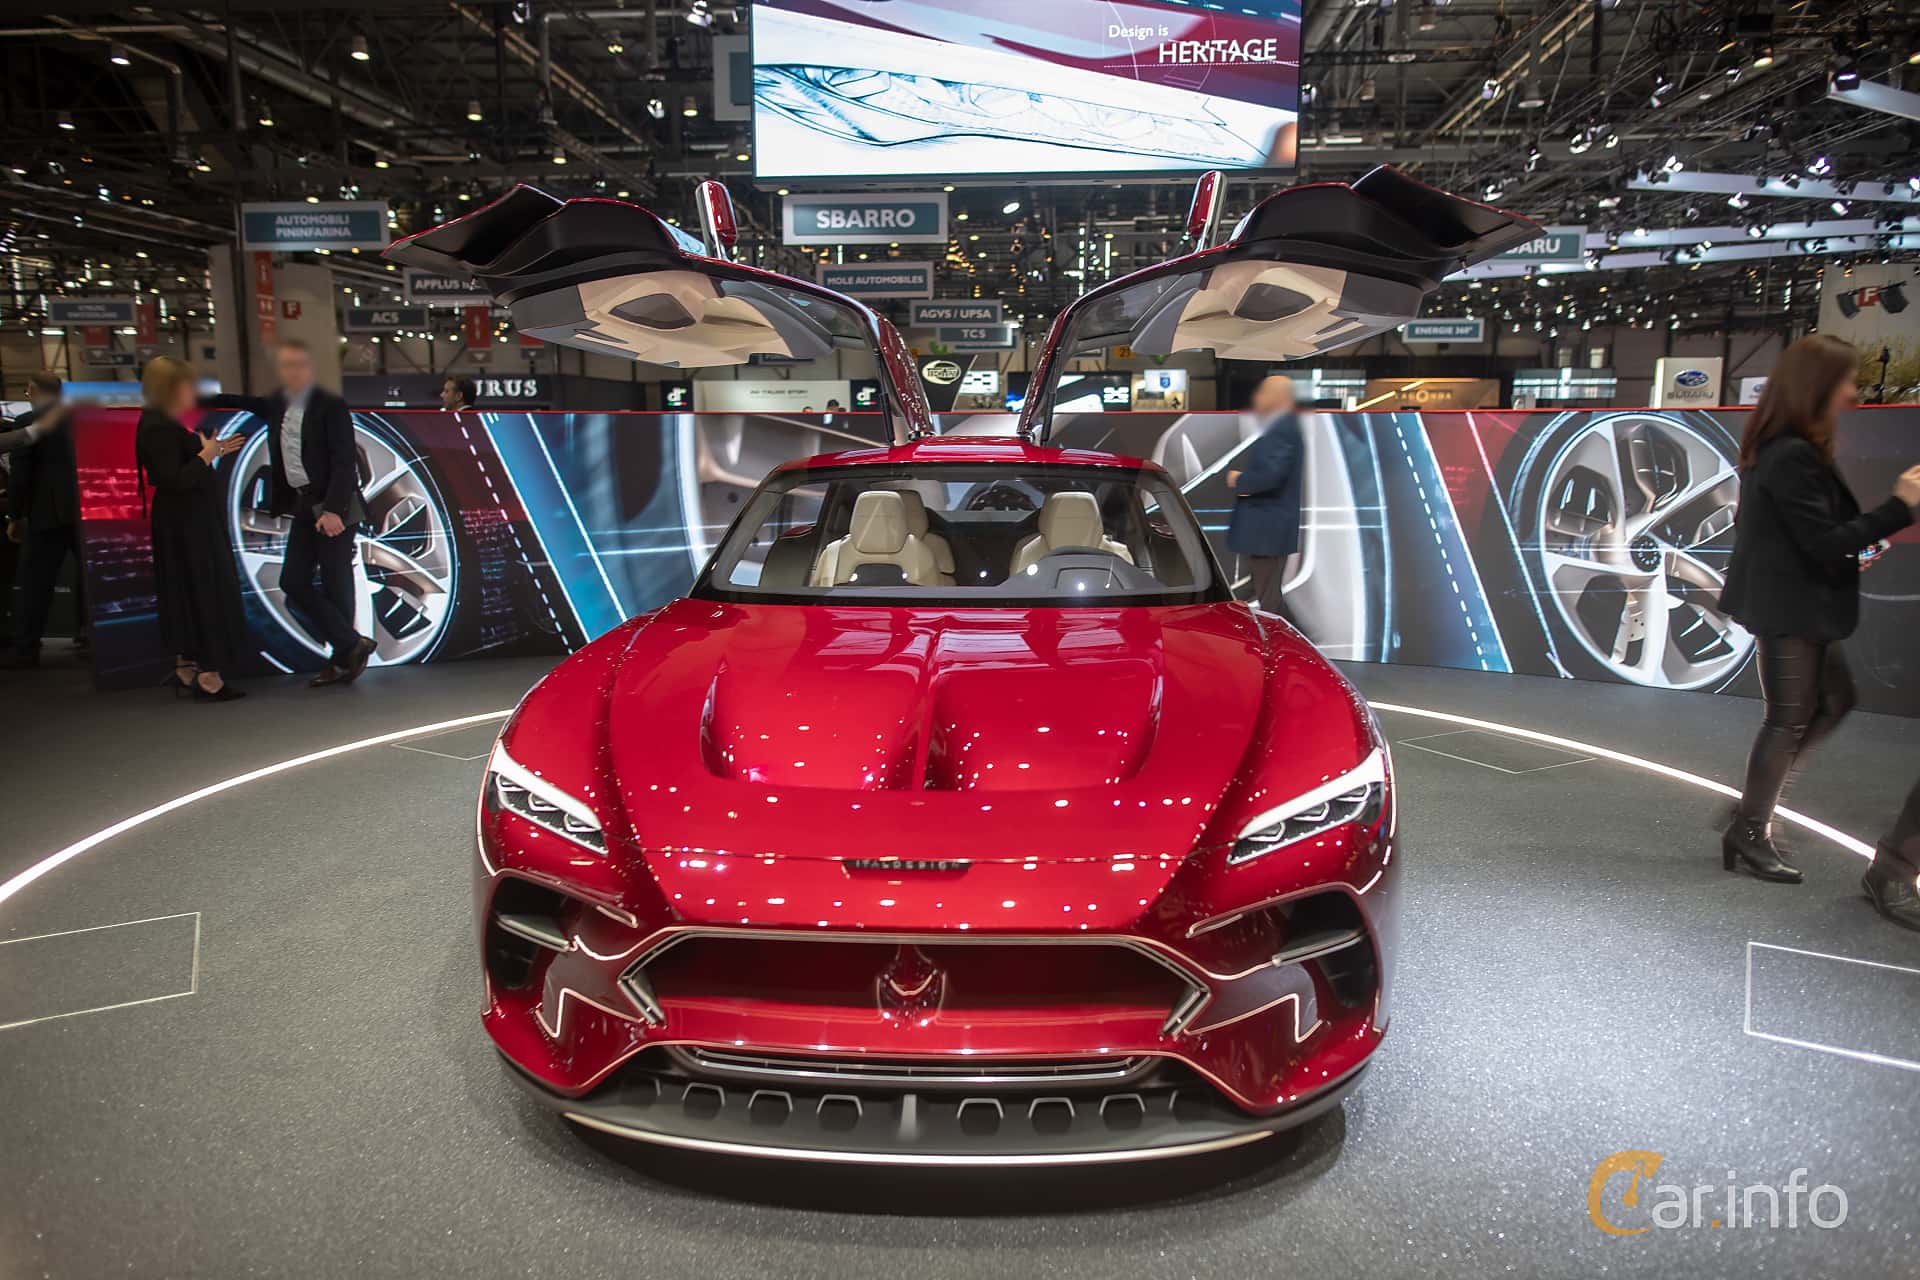 Italdesign DaVinci Concept Concept, 2019 at Geneva Motor Show 2019